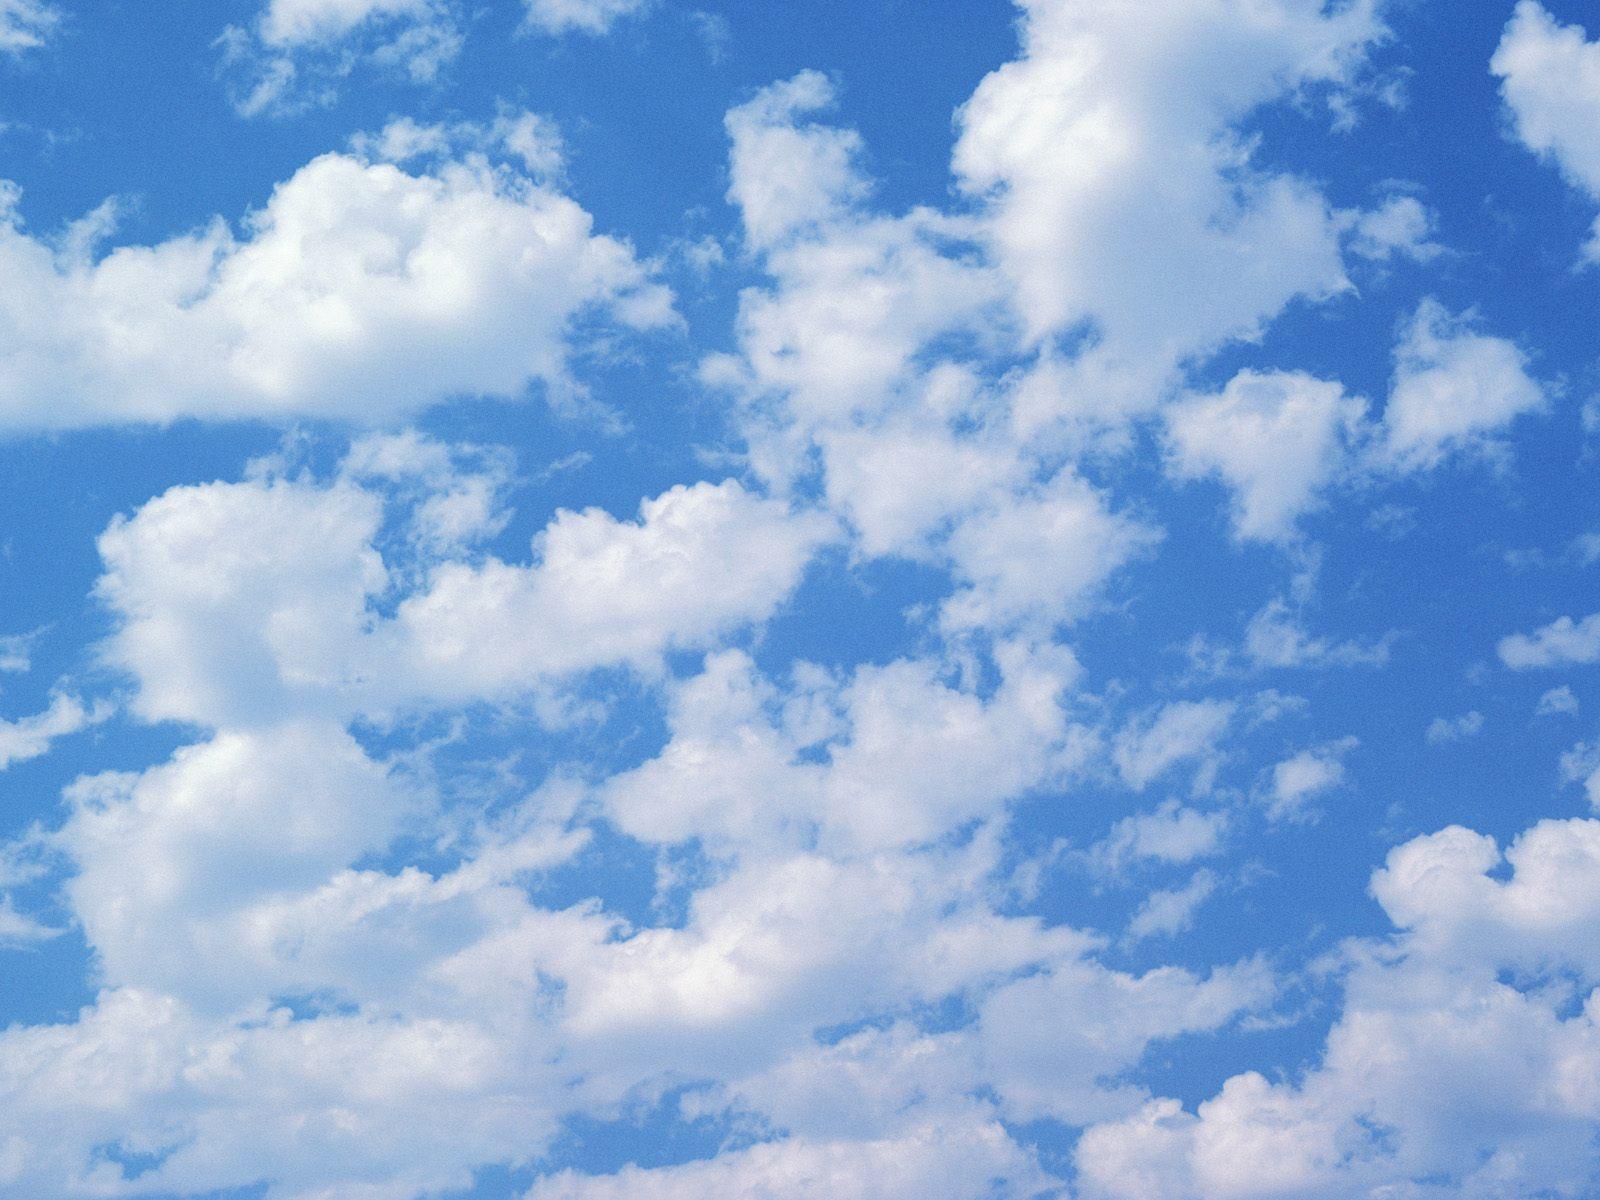 clouds wallpaper 1080p hd desktop wallpapers 4k hd